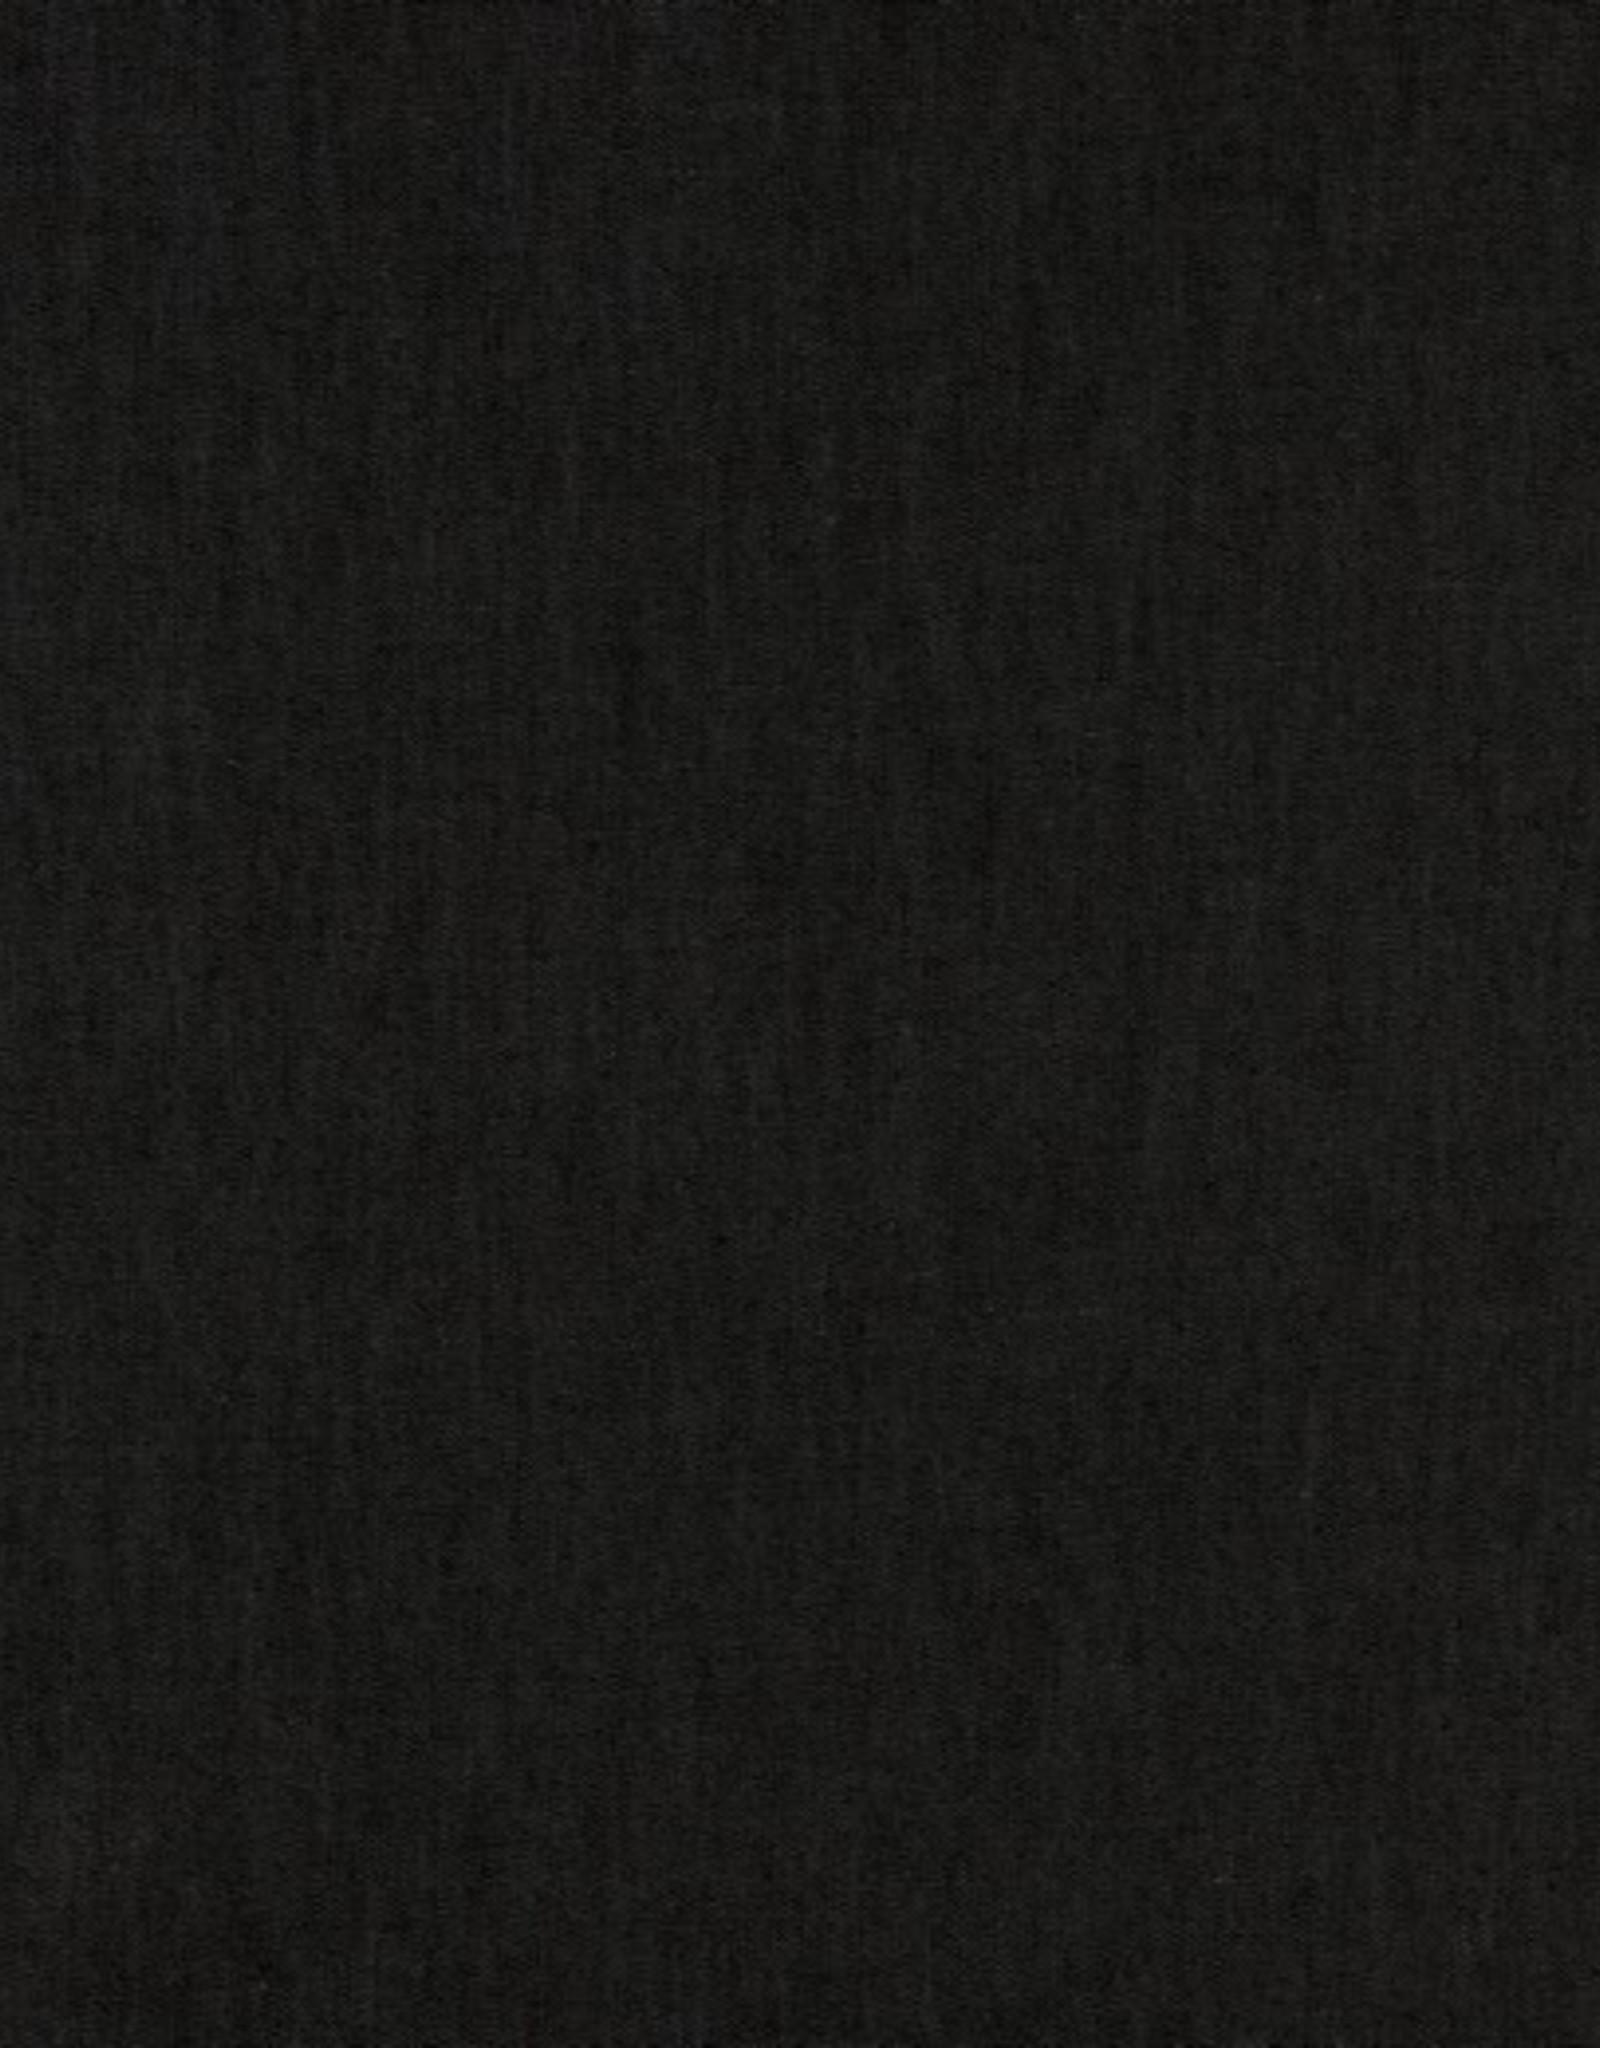 Chambray denim black